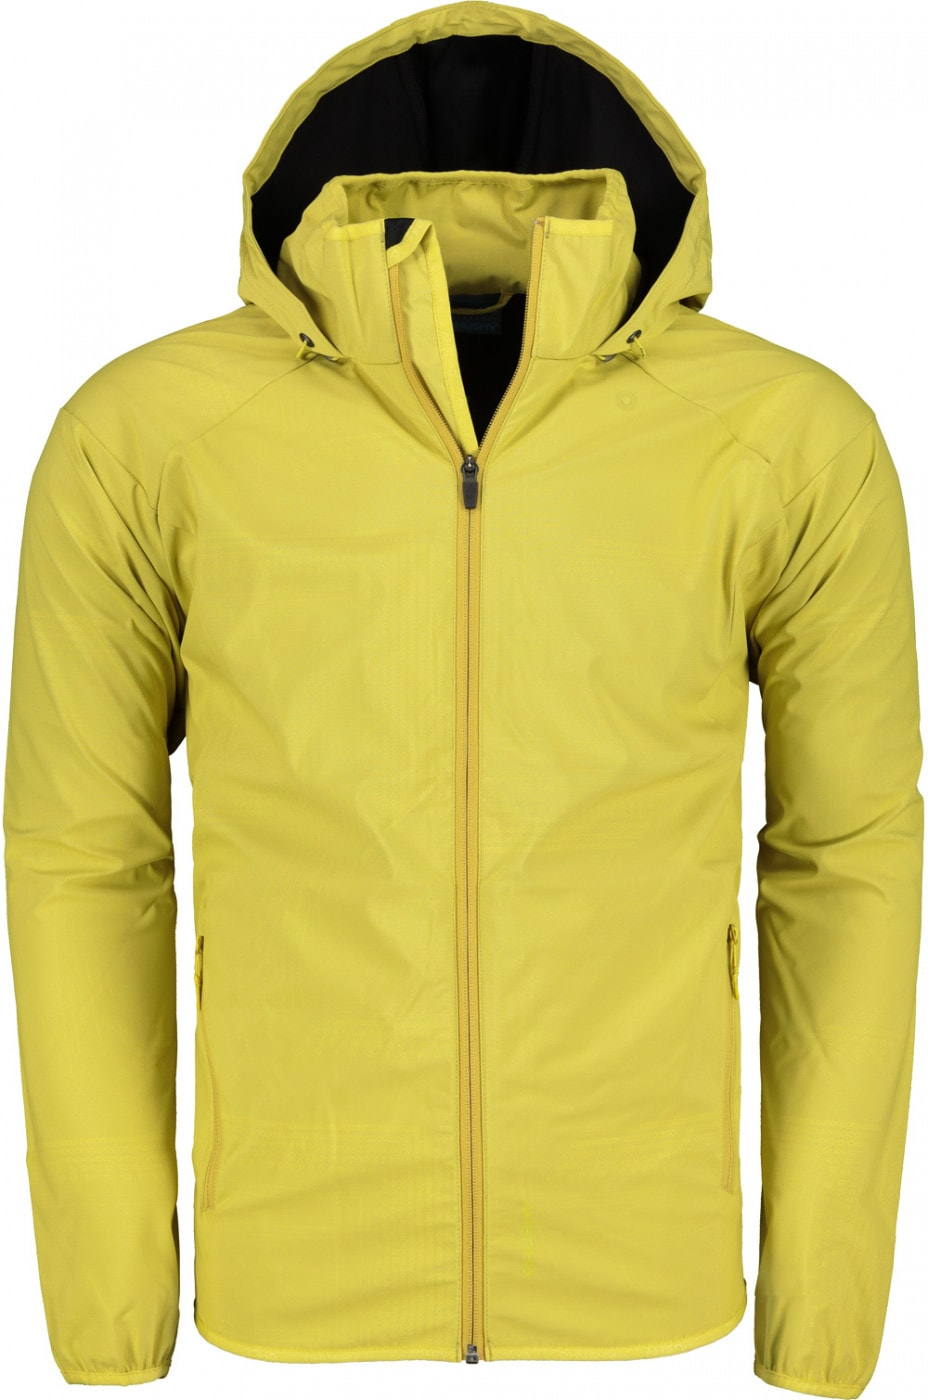 Men's jacket HUSKY SALLY M